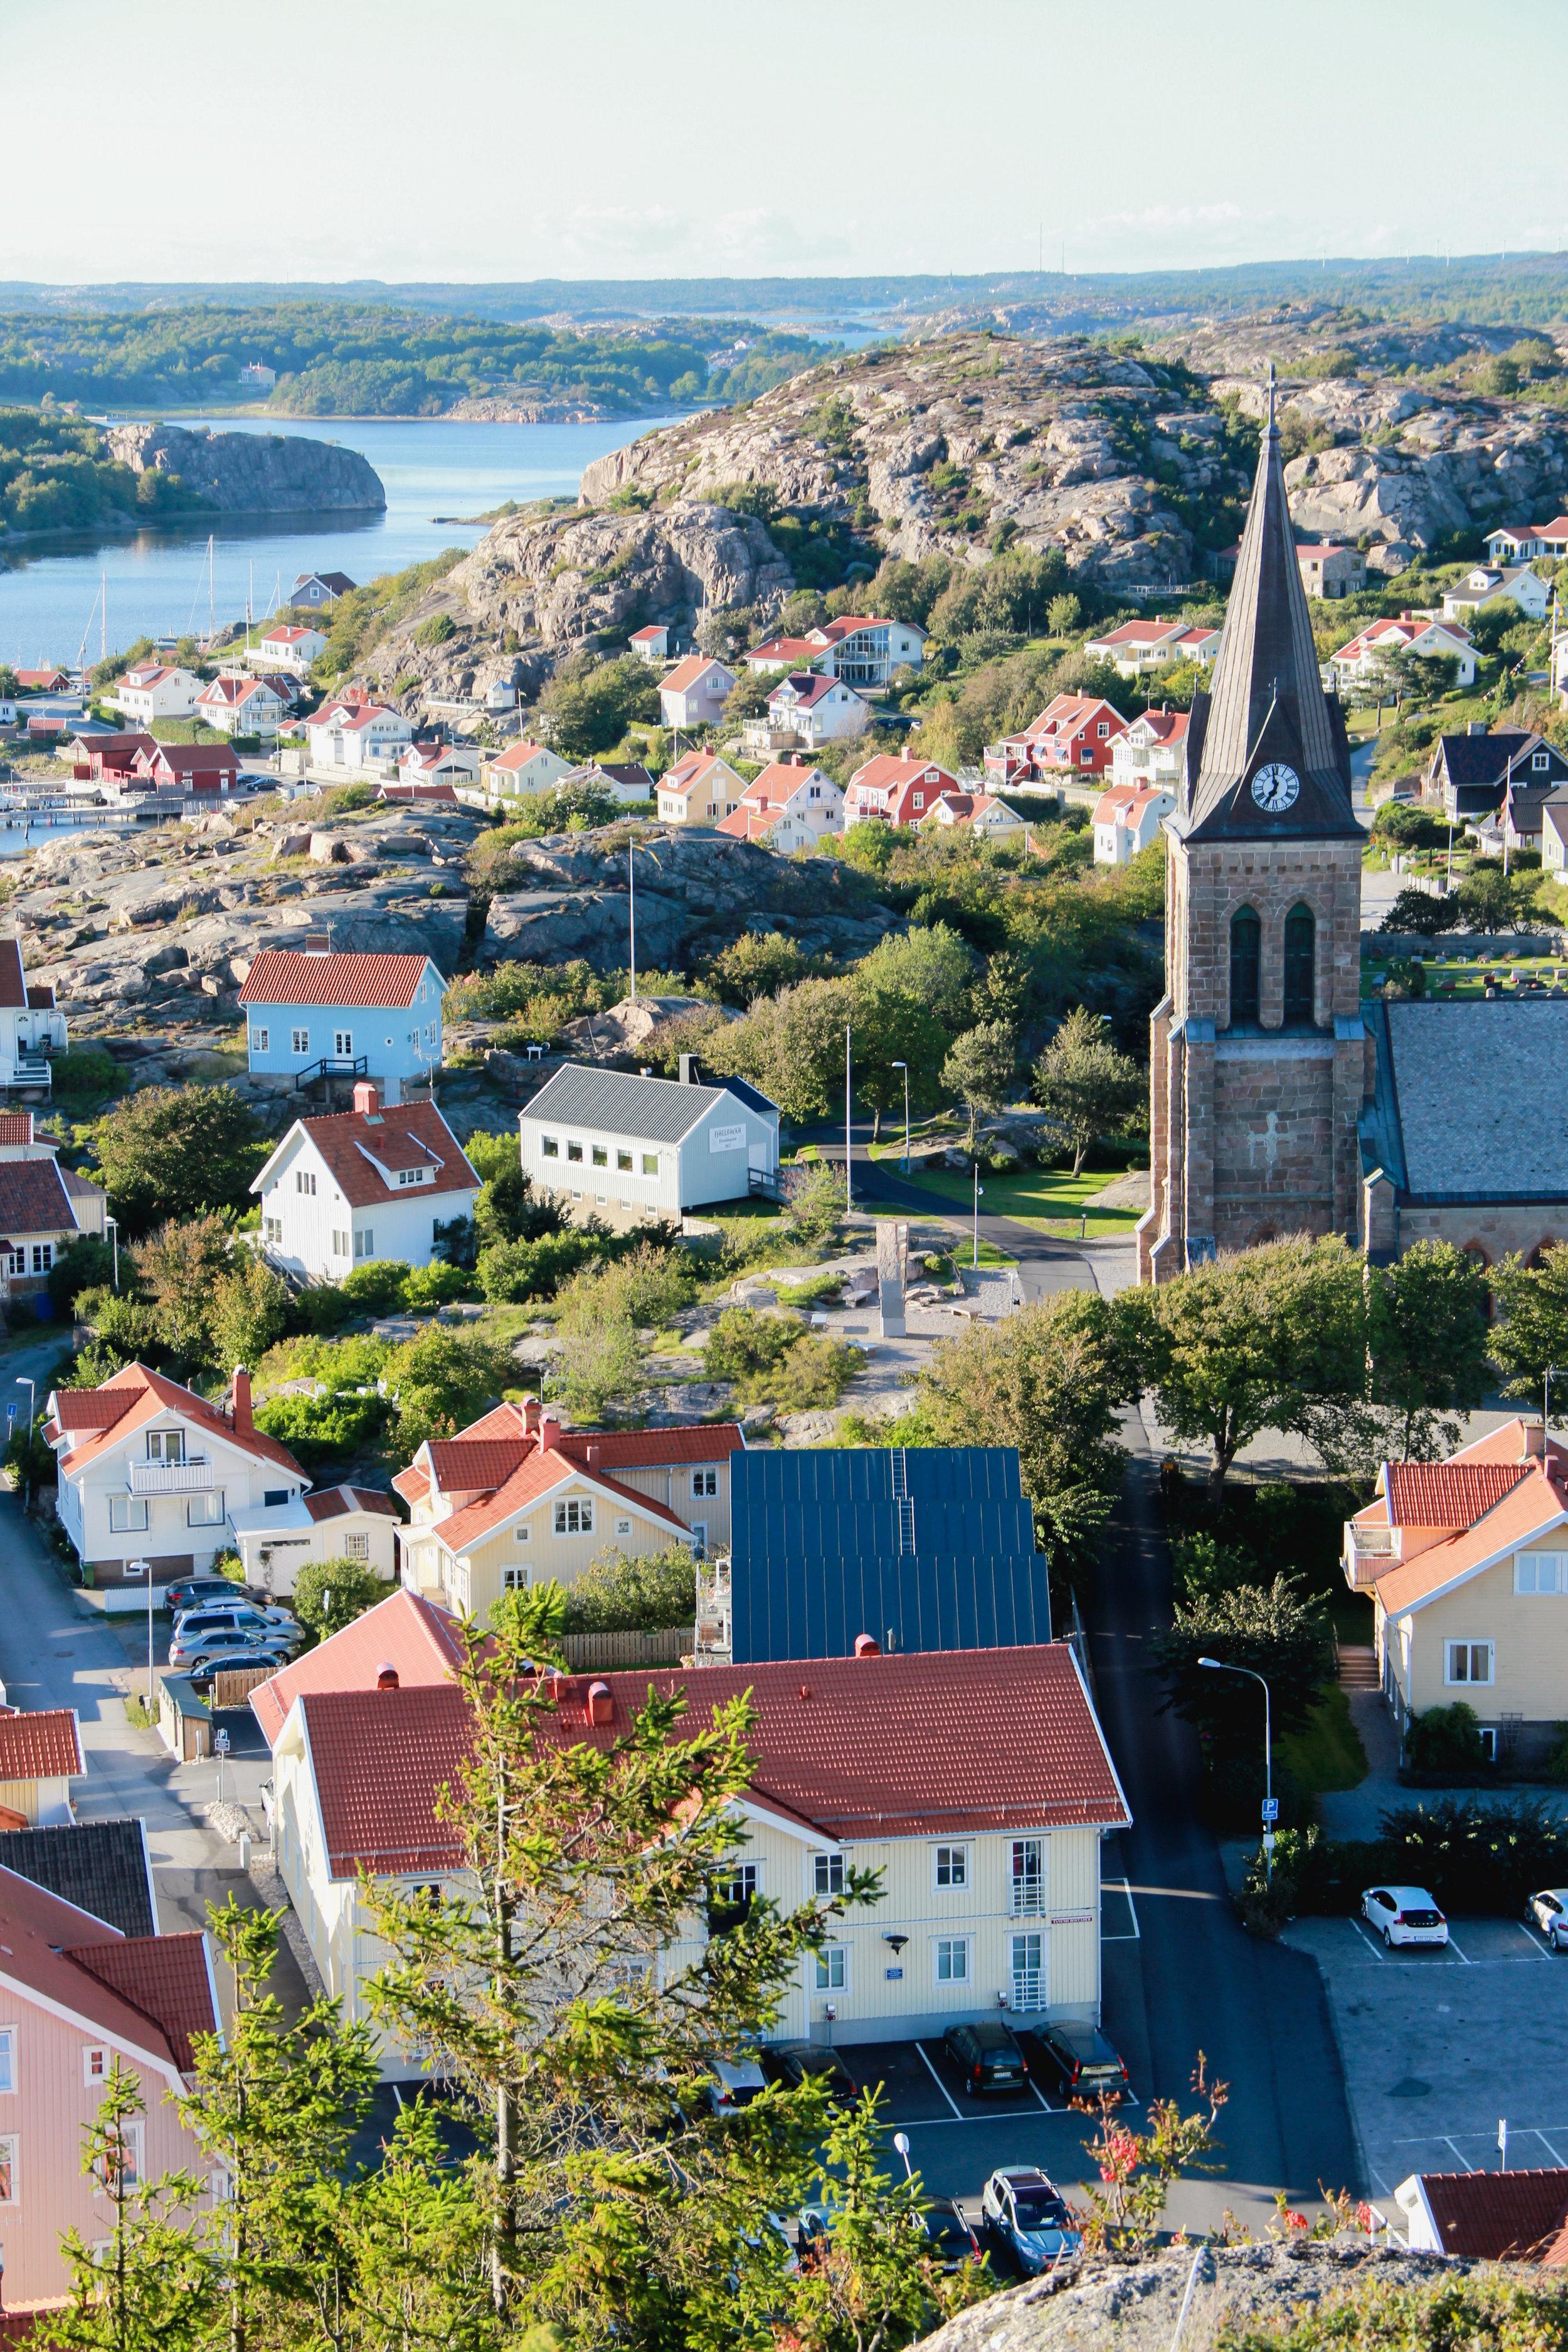 Bohulsan Coast Where the Swedes Summer-20.jpg